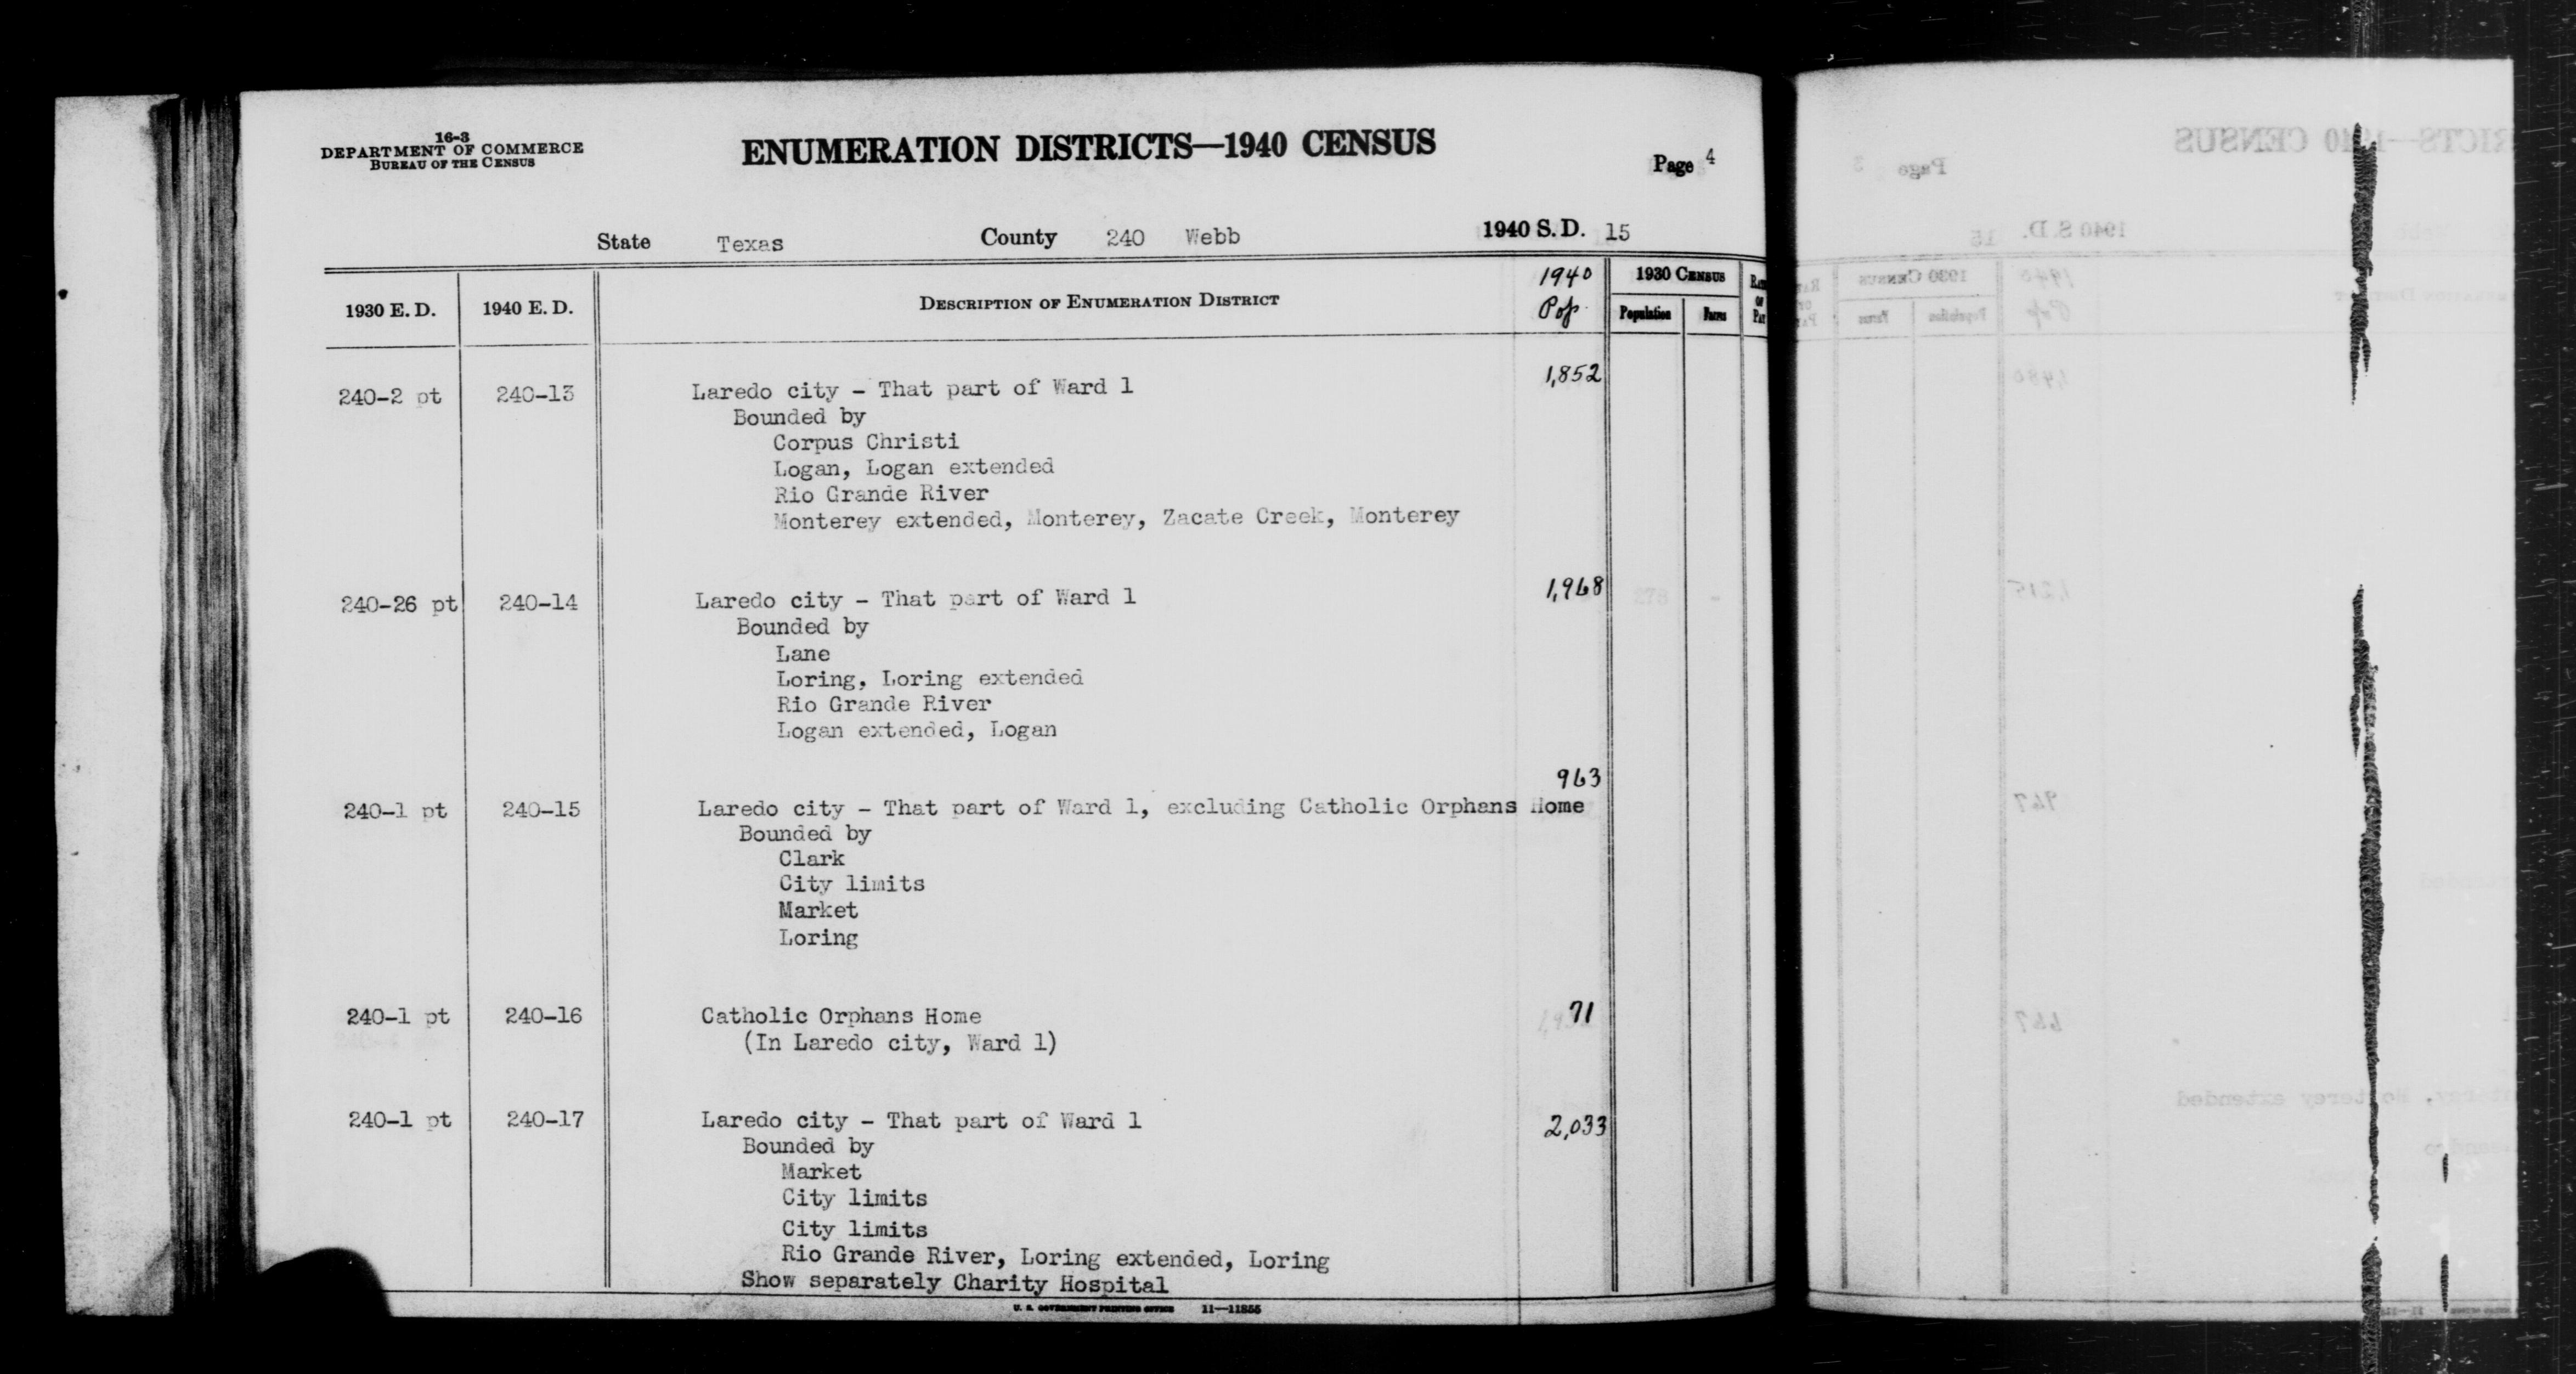 1940 Census Enumeration District Descriptions - Texas - Webb County - ED 240-13, ED 240-14, ED 240-15, ED 240-16, ED 240-17